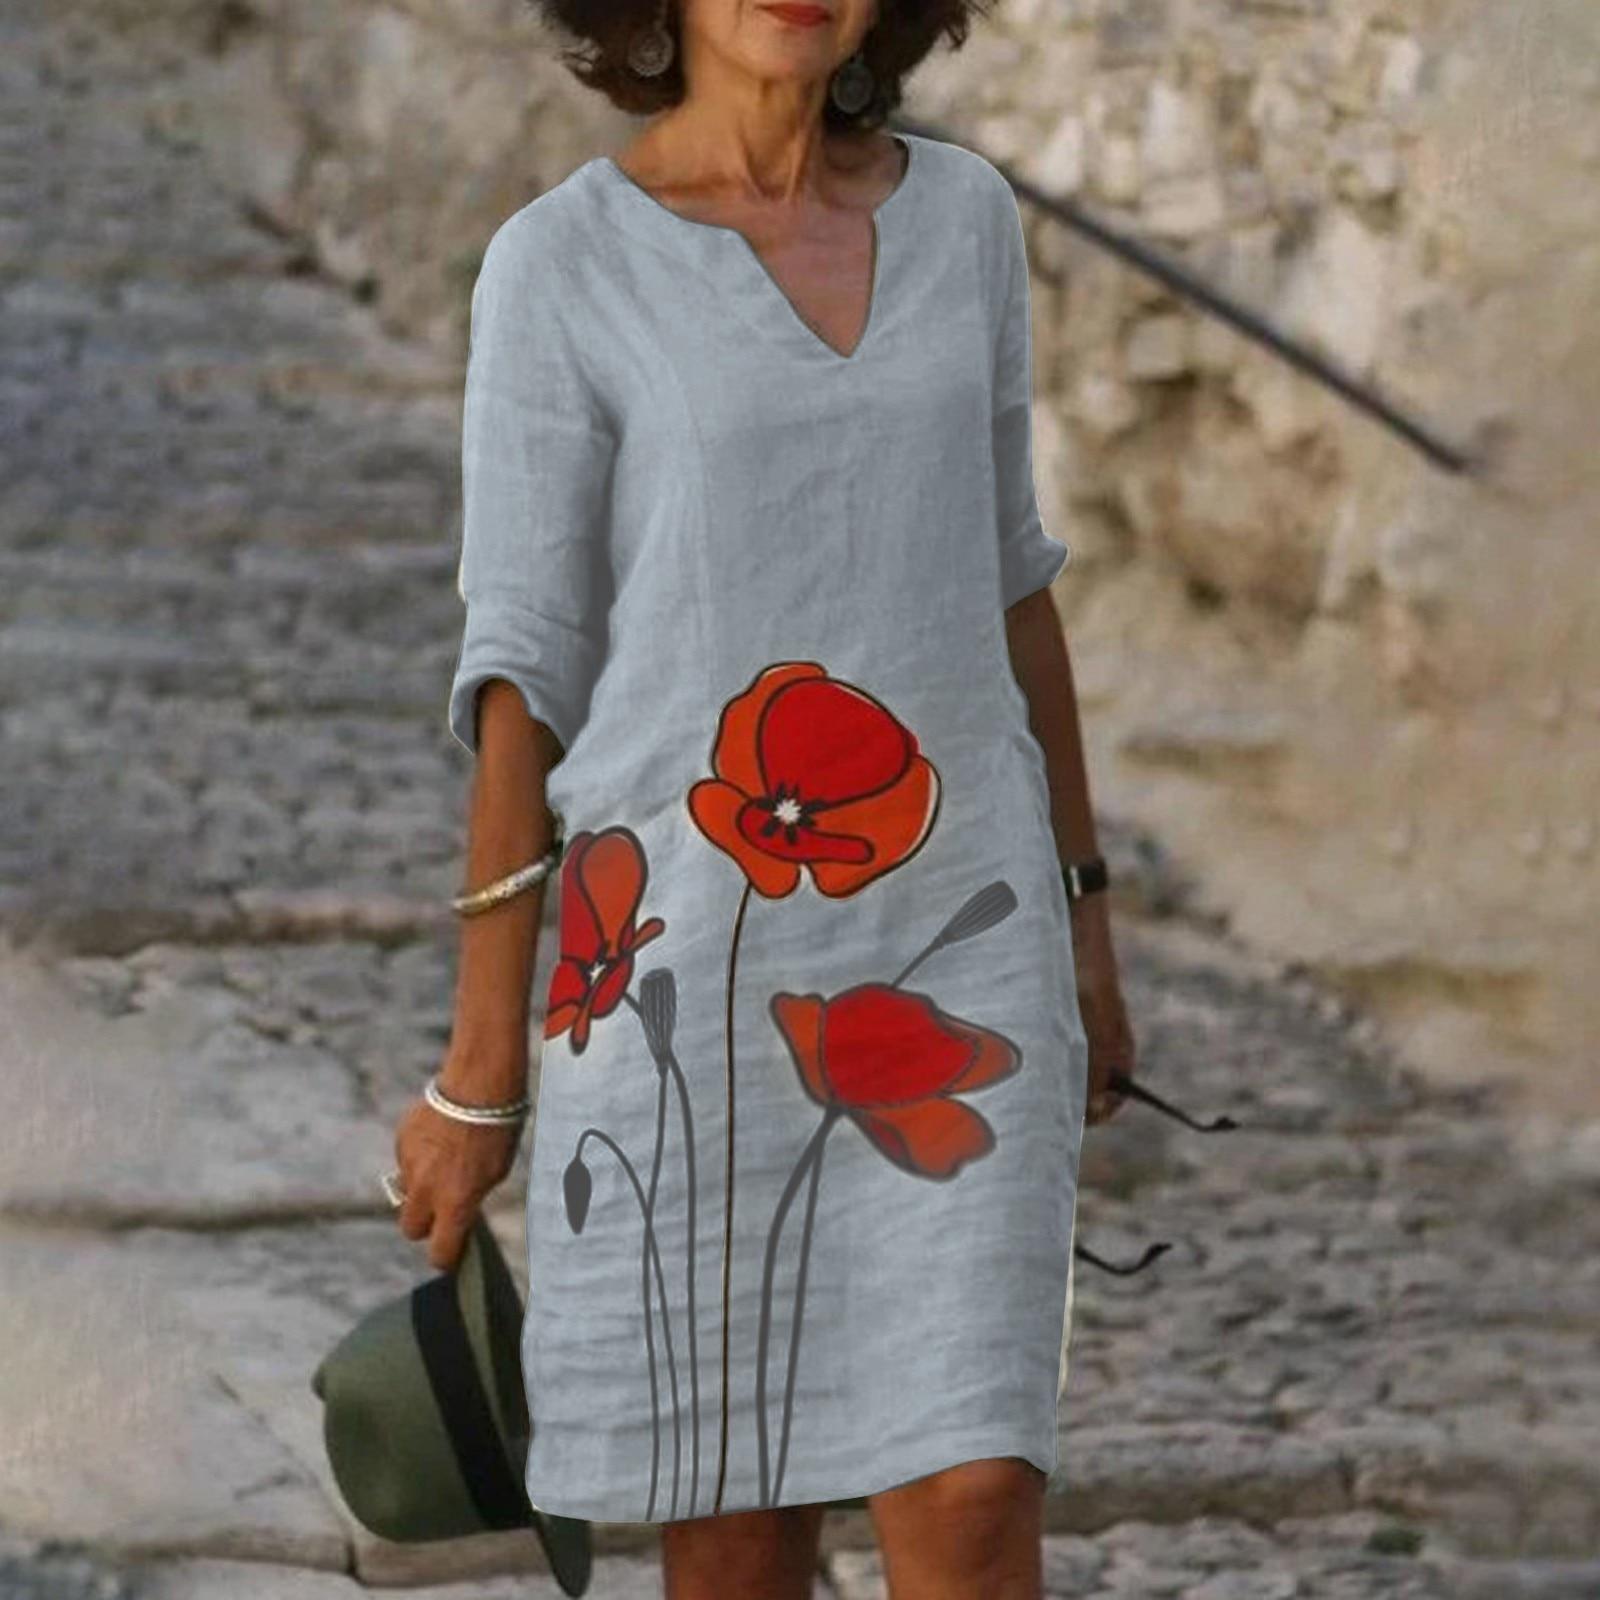 Women's Summer Sexy Dress Temperament Vintage Printed Casual V-neck Ladies Dress Beach Stylish Short Sleeve Dress Vestidos #t3g